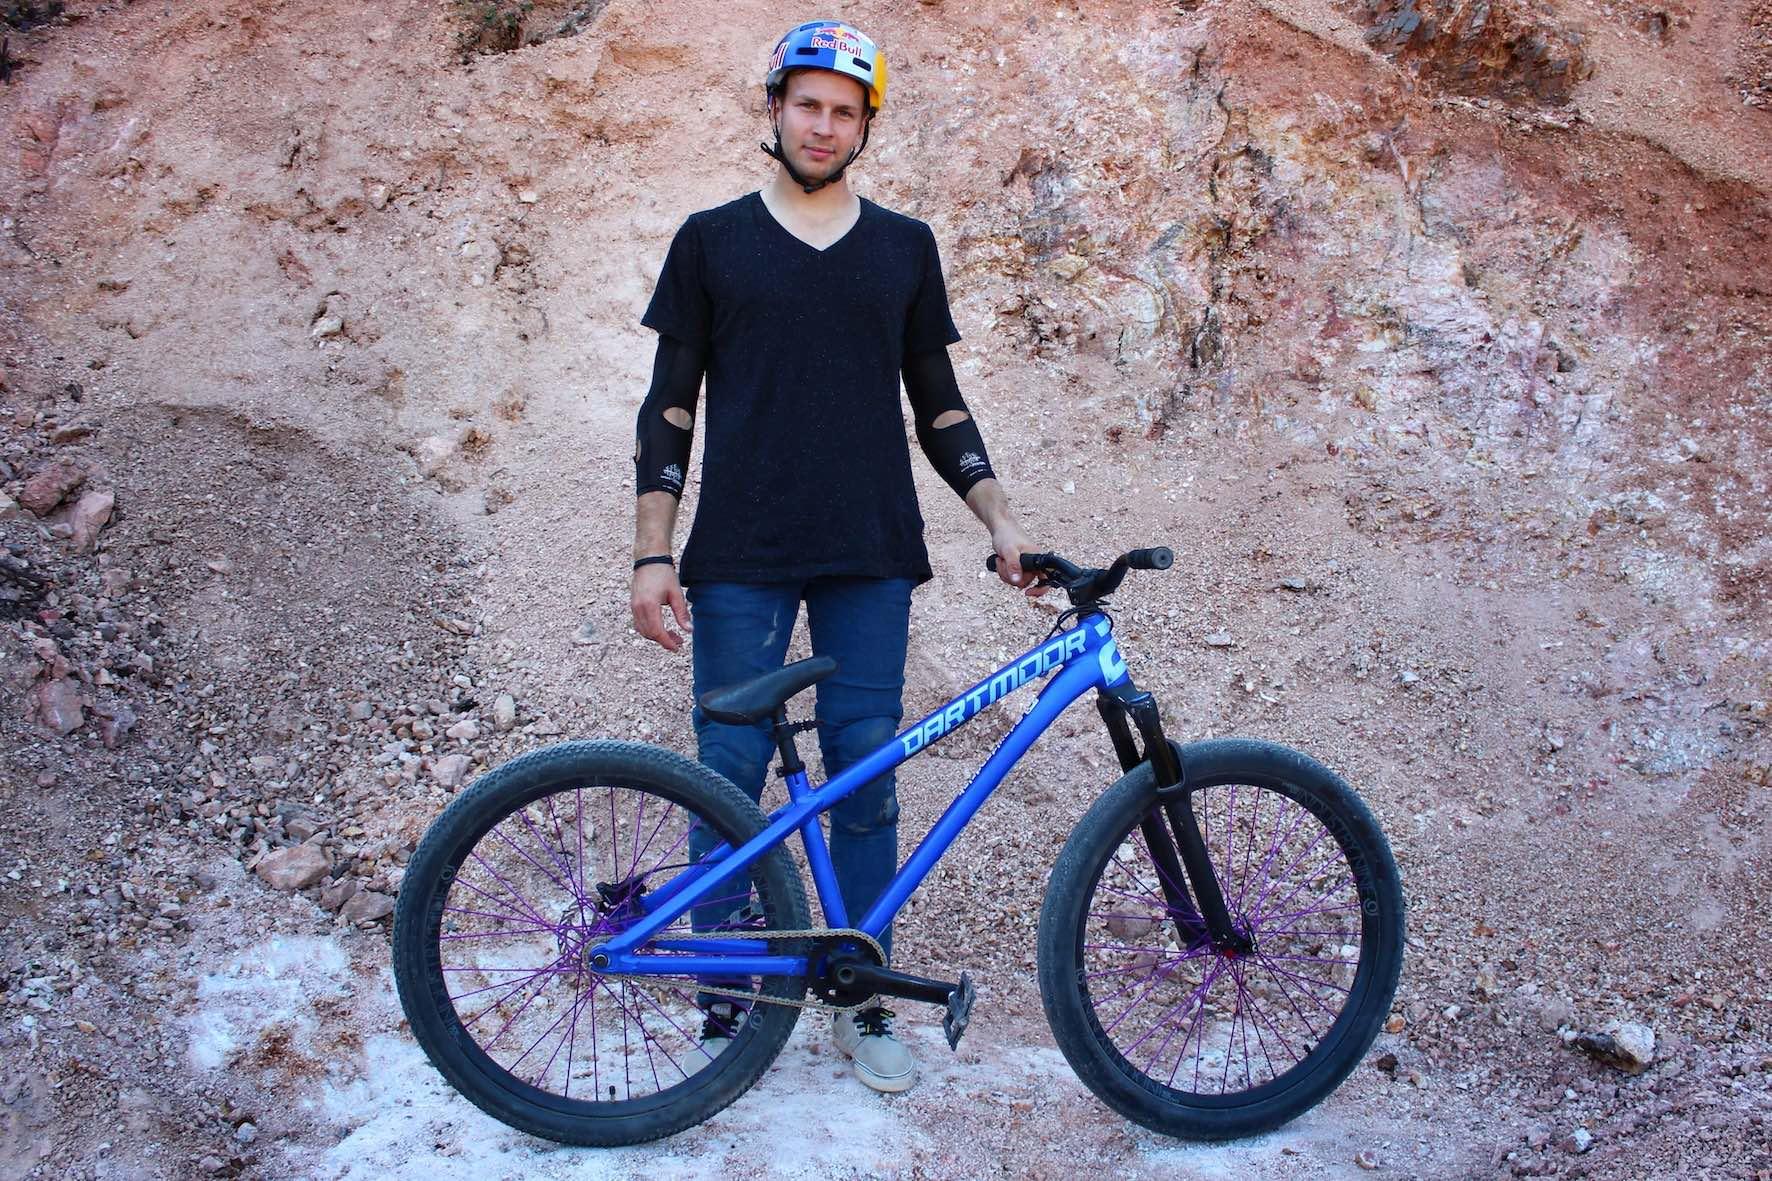 David Godziek Dartmoor 26 Player Audi Nines bike